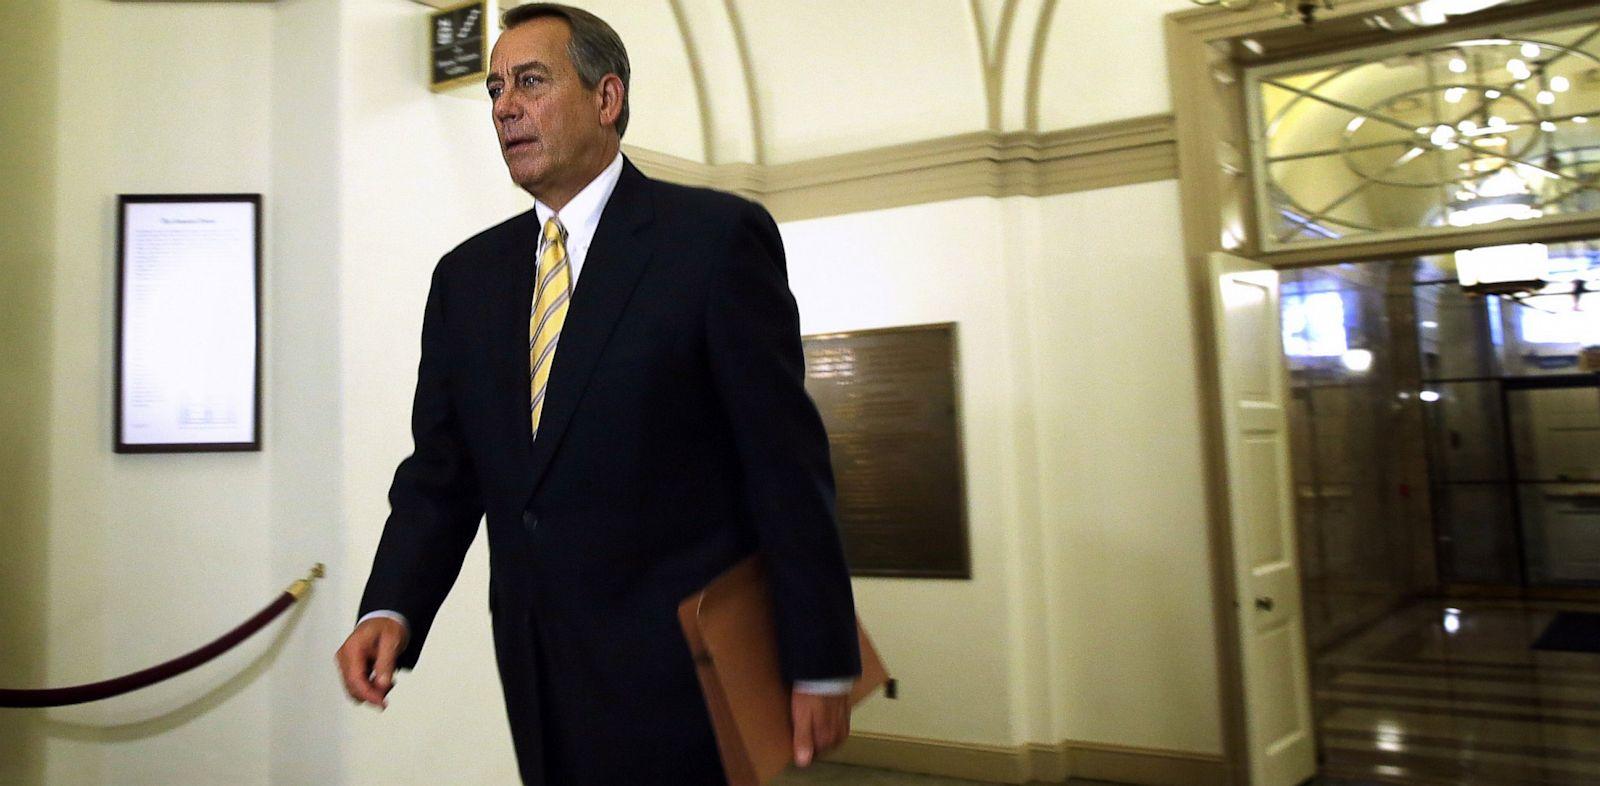 PHOTO: Rep. John Boehner arrives at the U.S. Capitol in Washington, DC., Oct. 9, 2013.